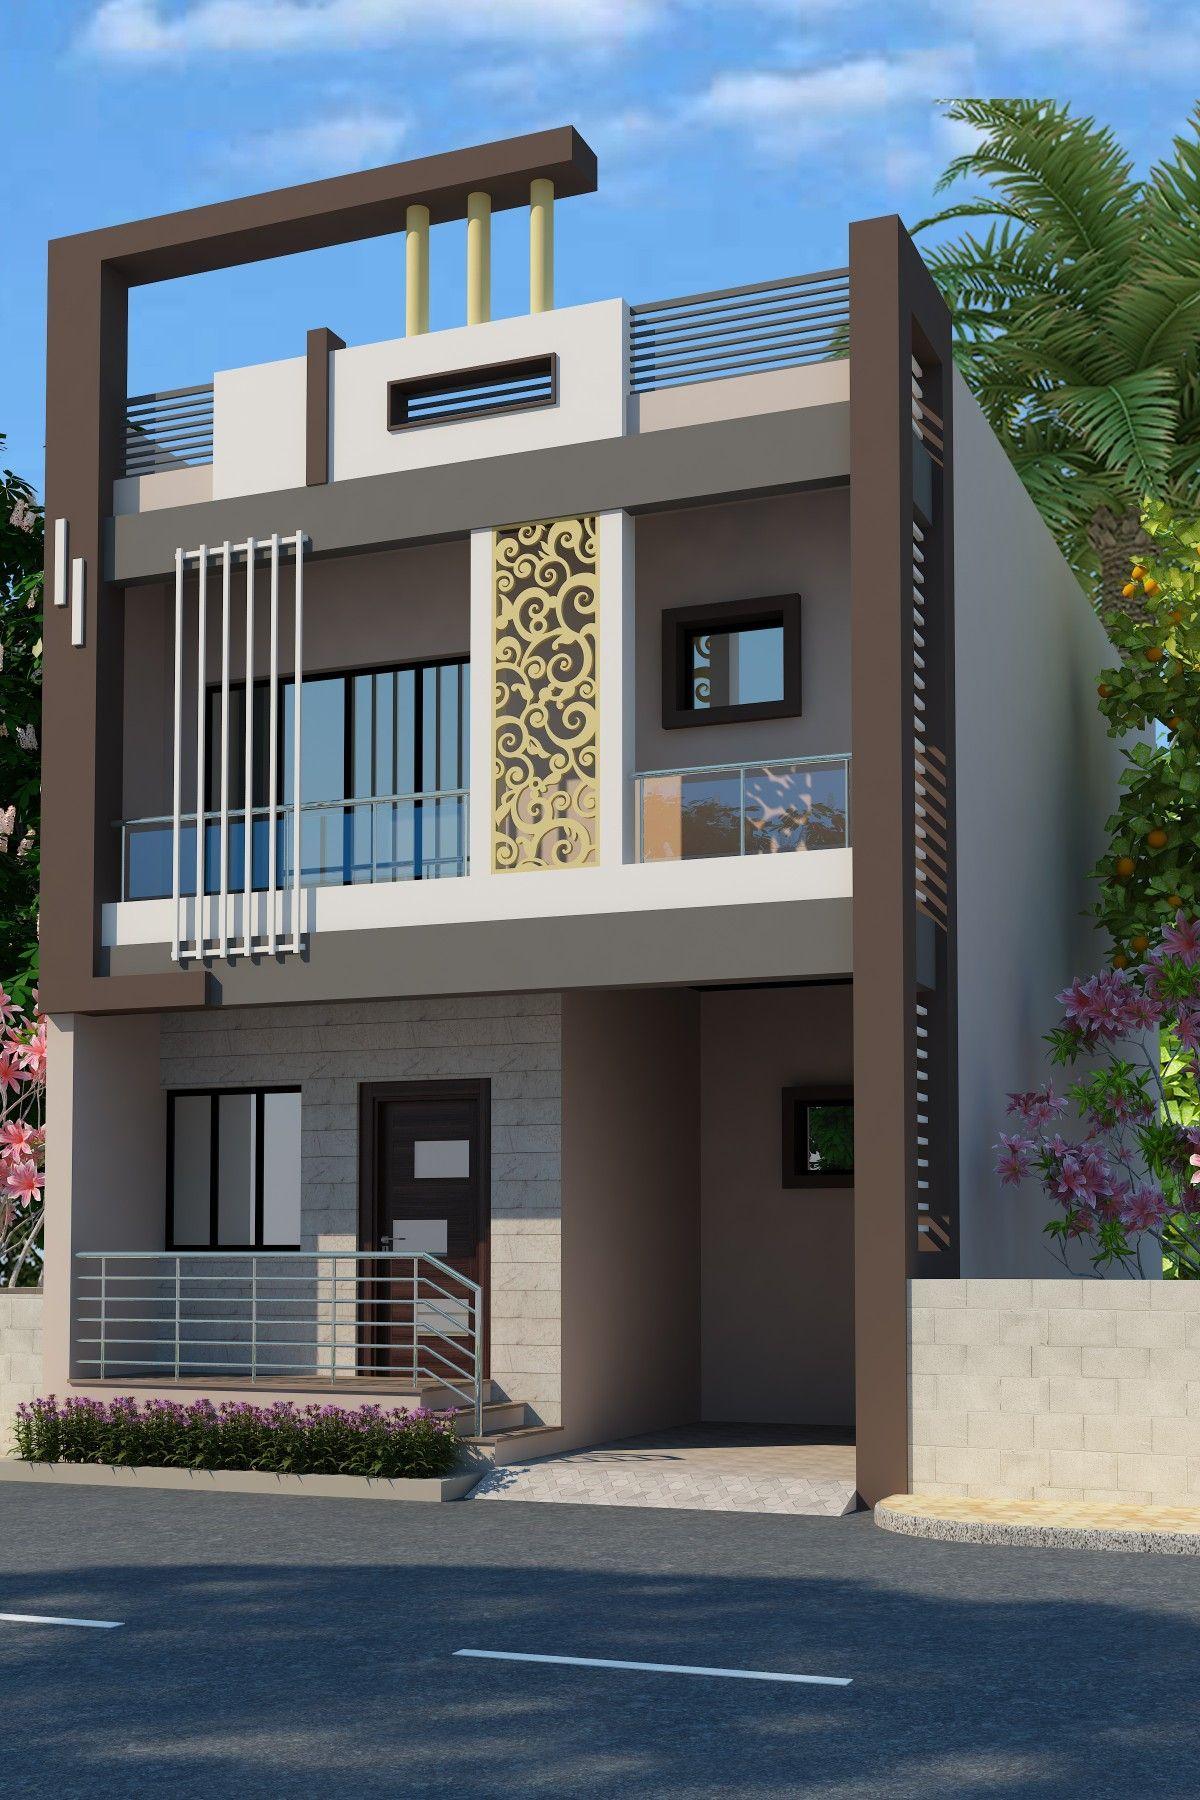 New Design In 2019 Minimalist House Design Bungalow Newsign In 2019 Bungalow House Small House Design Exterior Small House Elevation Small House Front Design